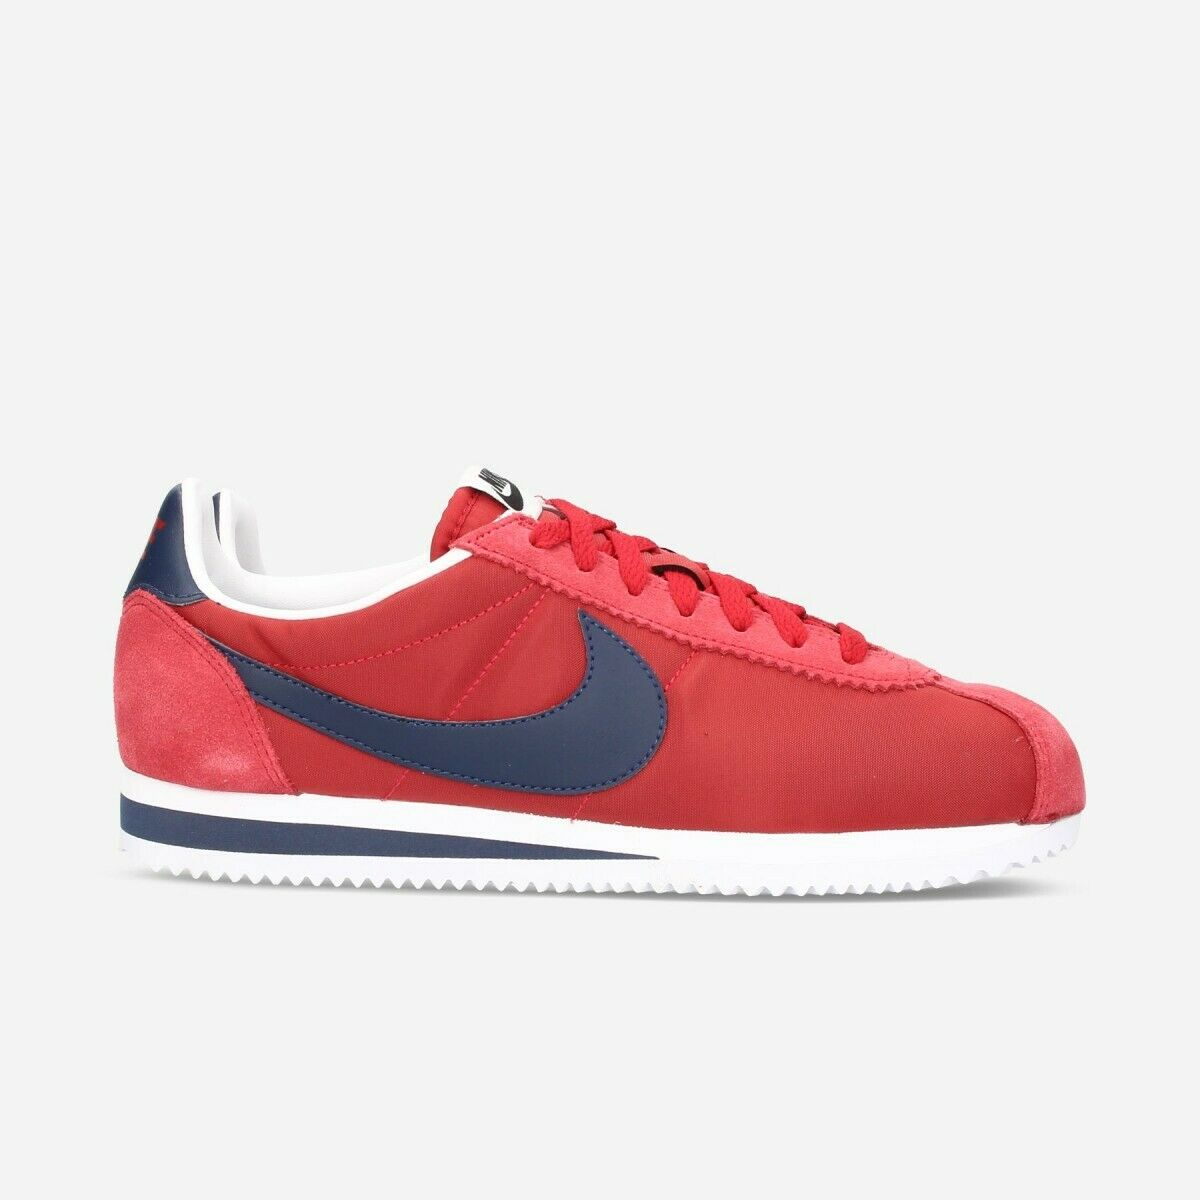 Nike Cortez Nylon 603 Varsity rojo Midnight ART zapatos 807472-603 FREE SHIPPING